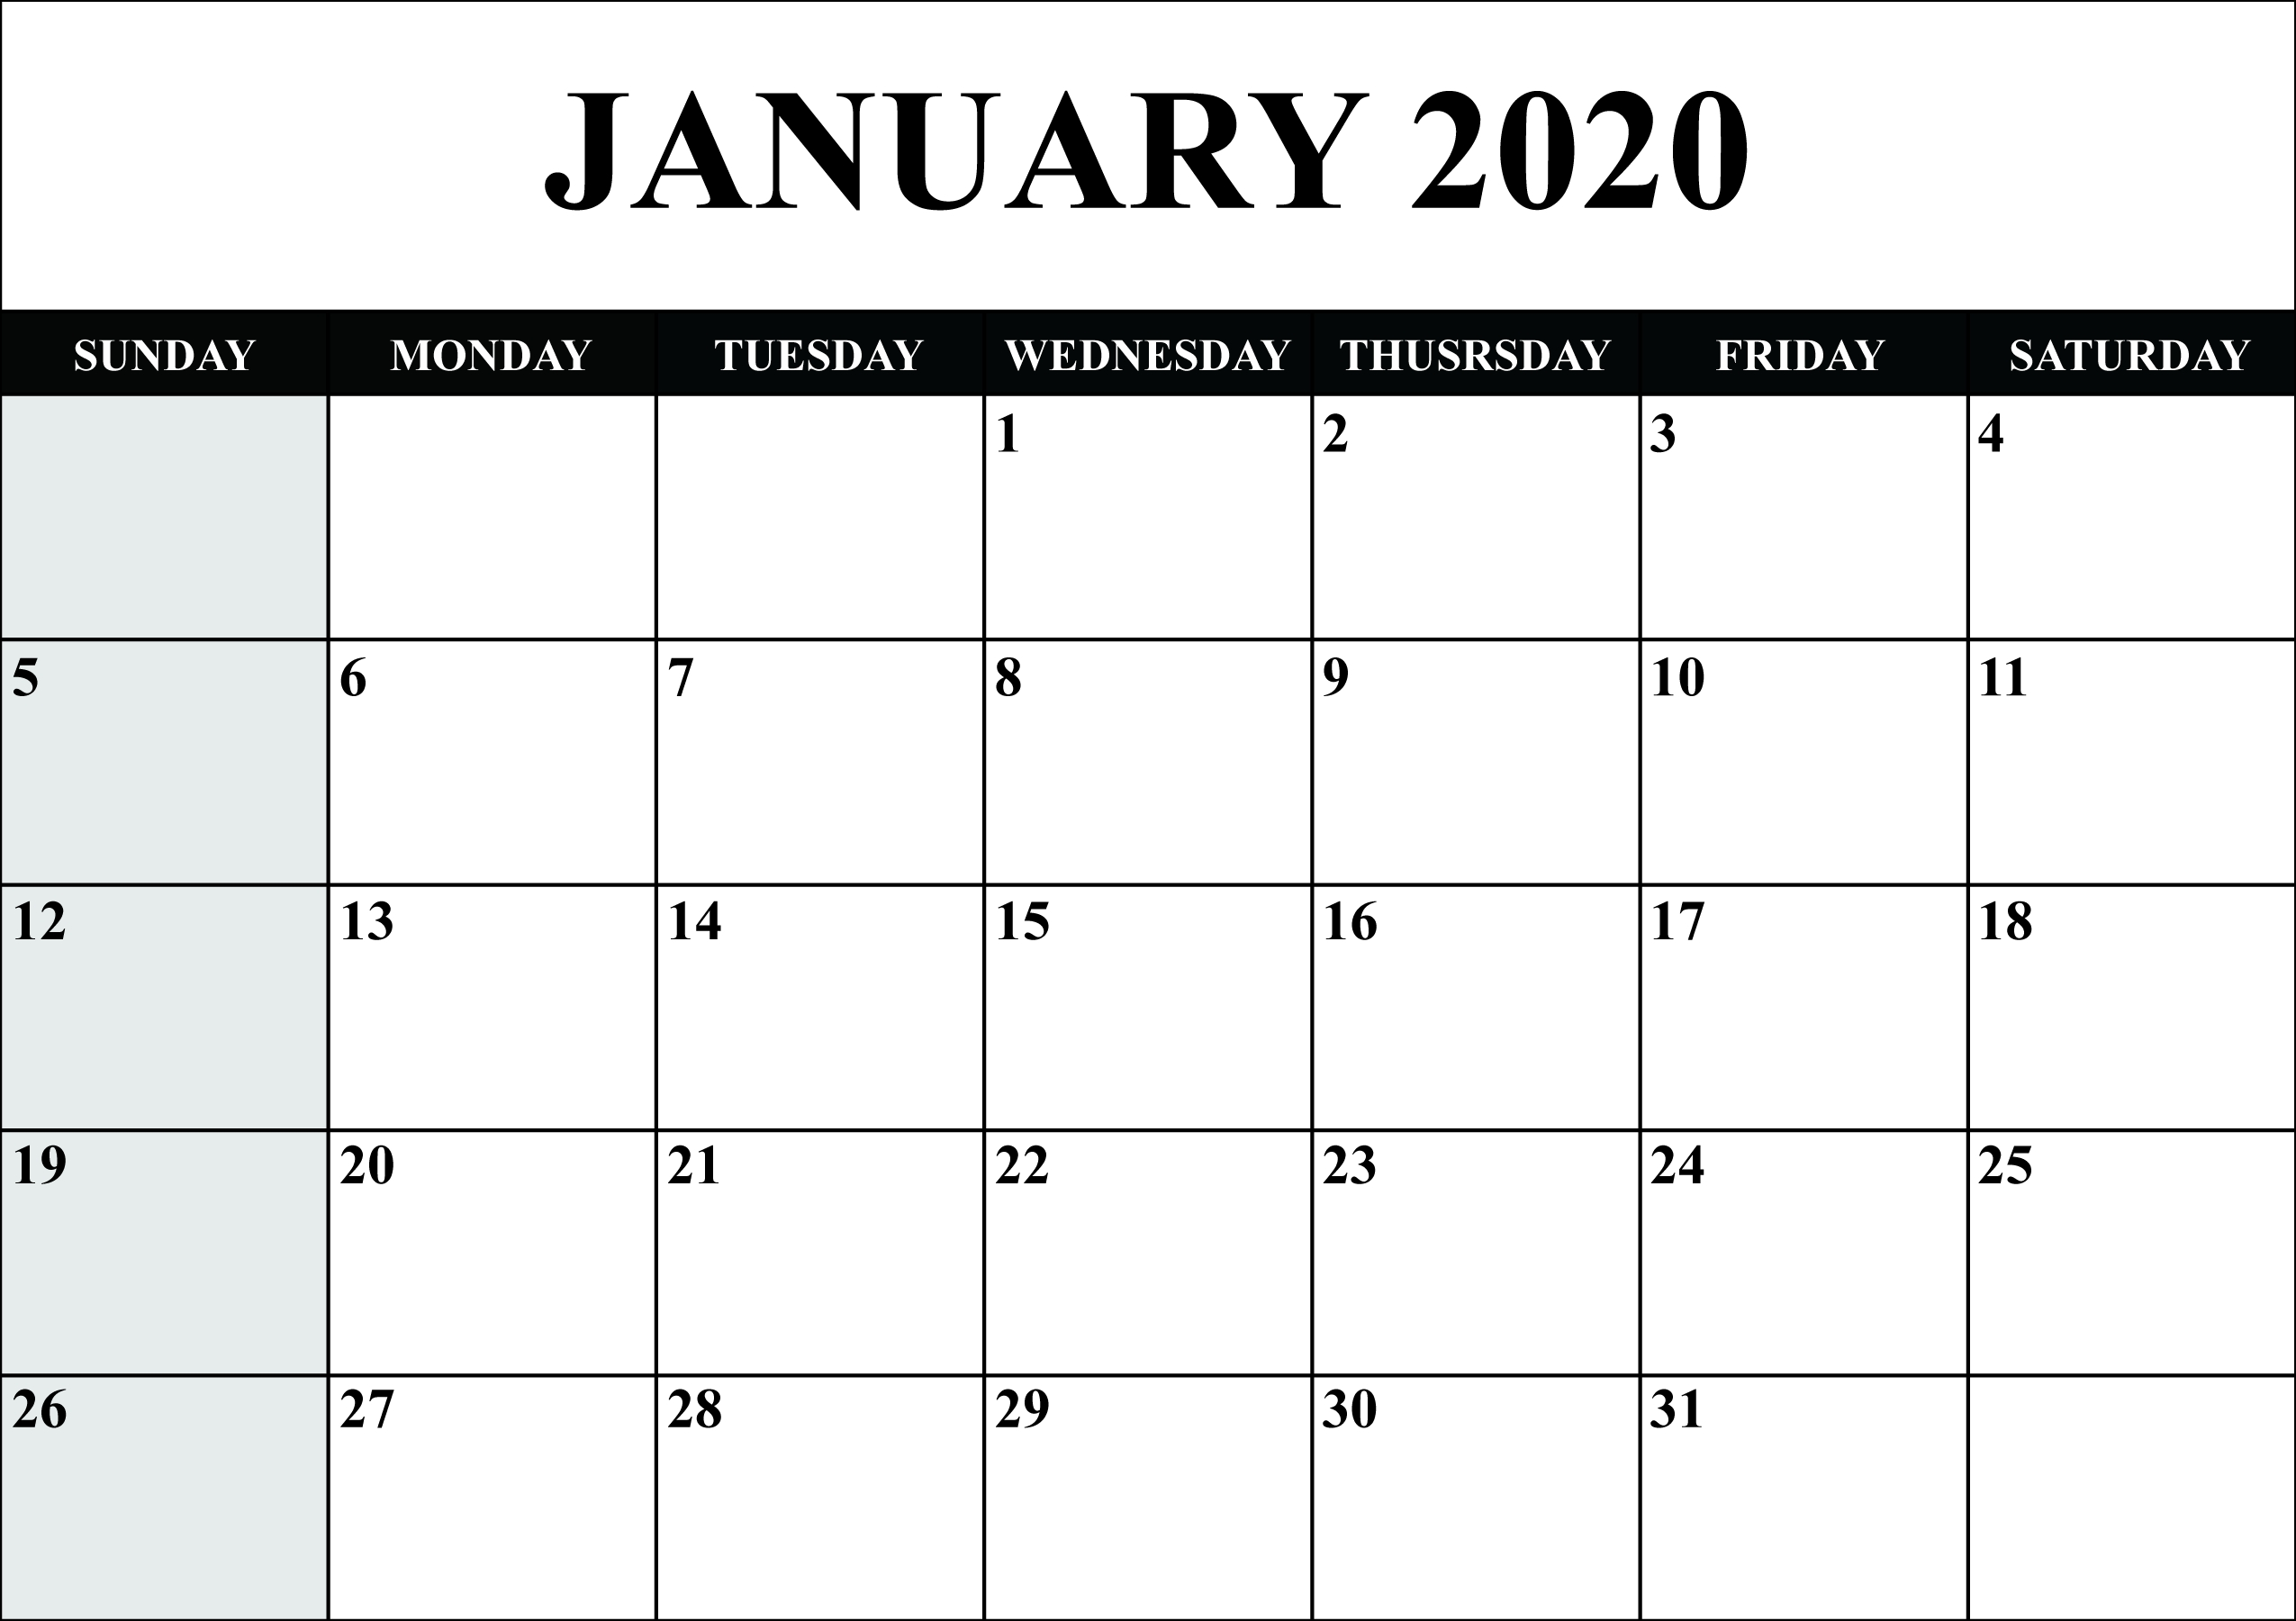 Free Blank January 2020 Calendar Printable In Pdf, Word-January 2020 Calendar Pdf